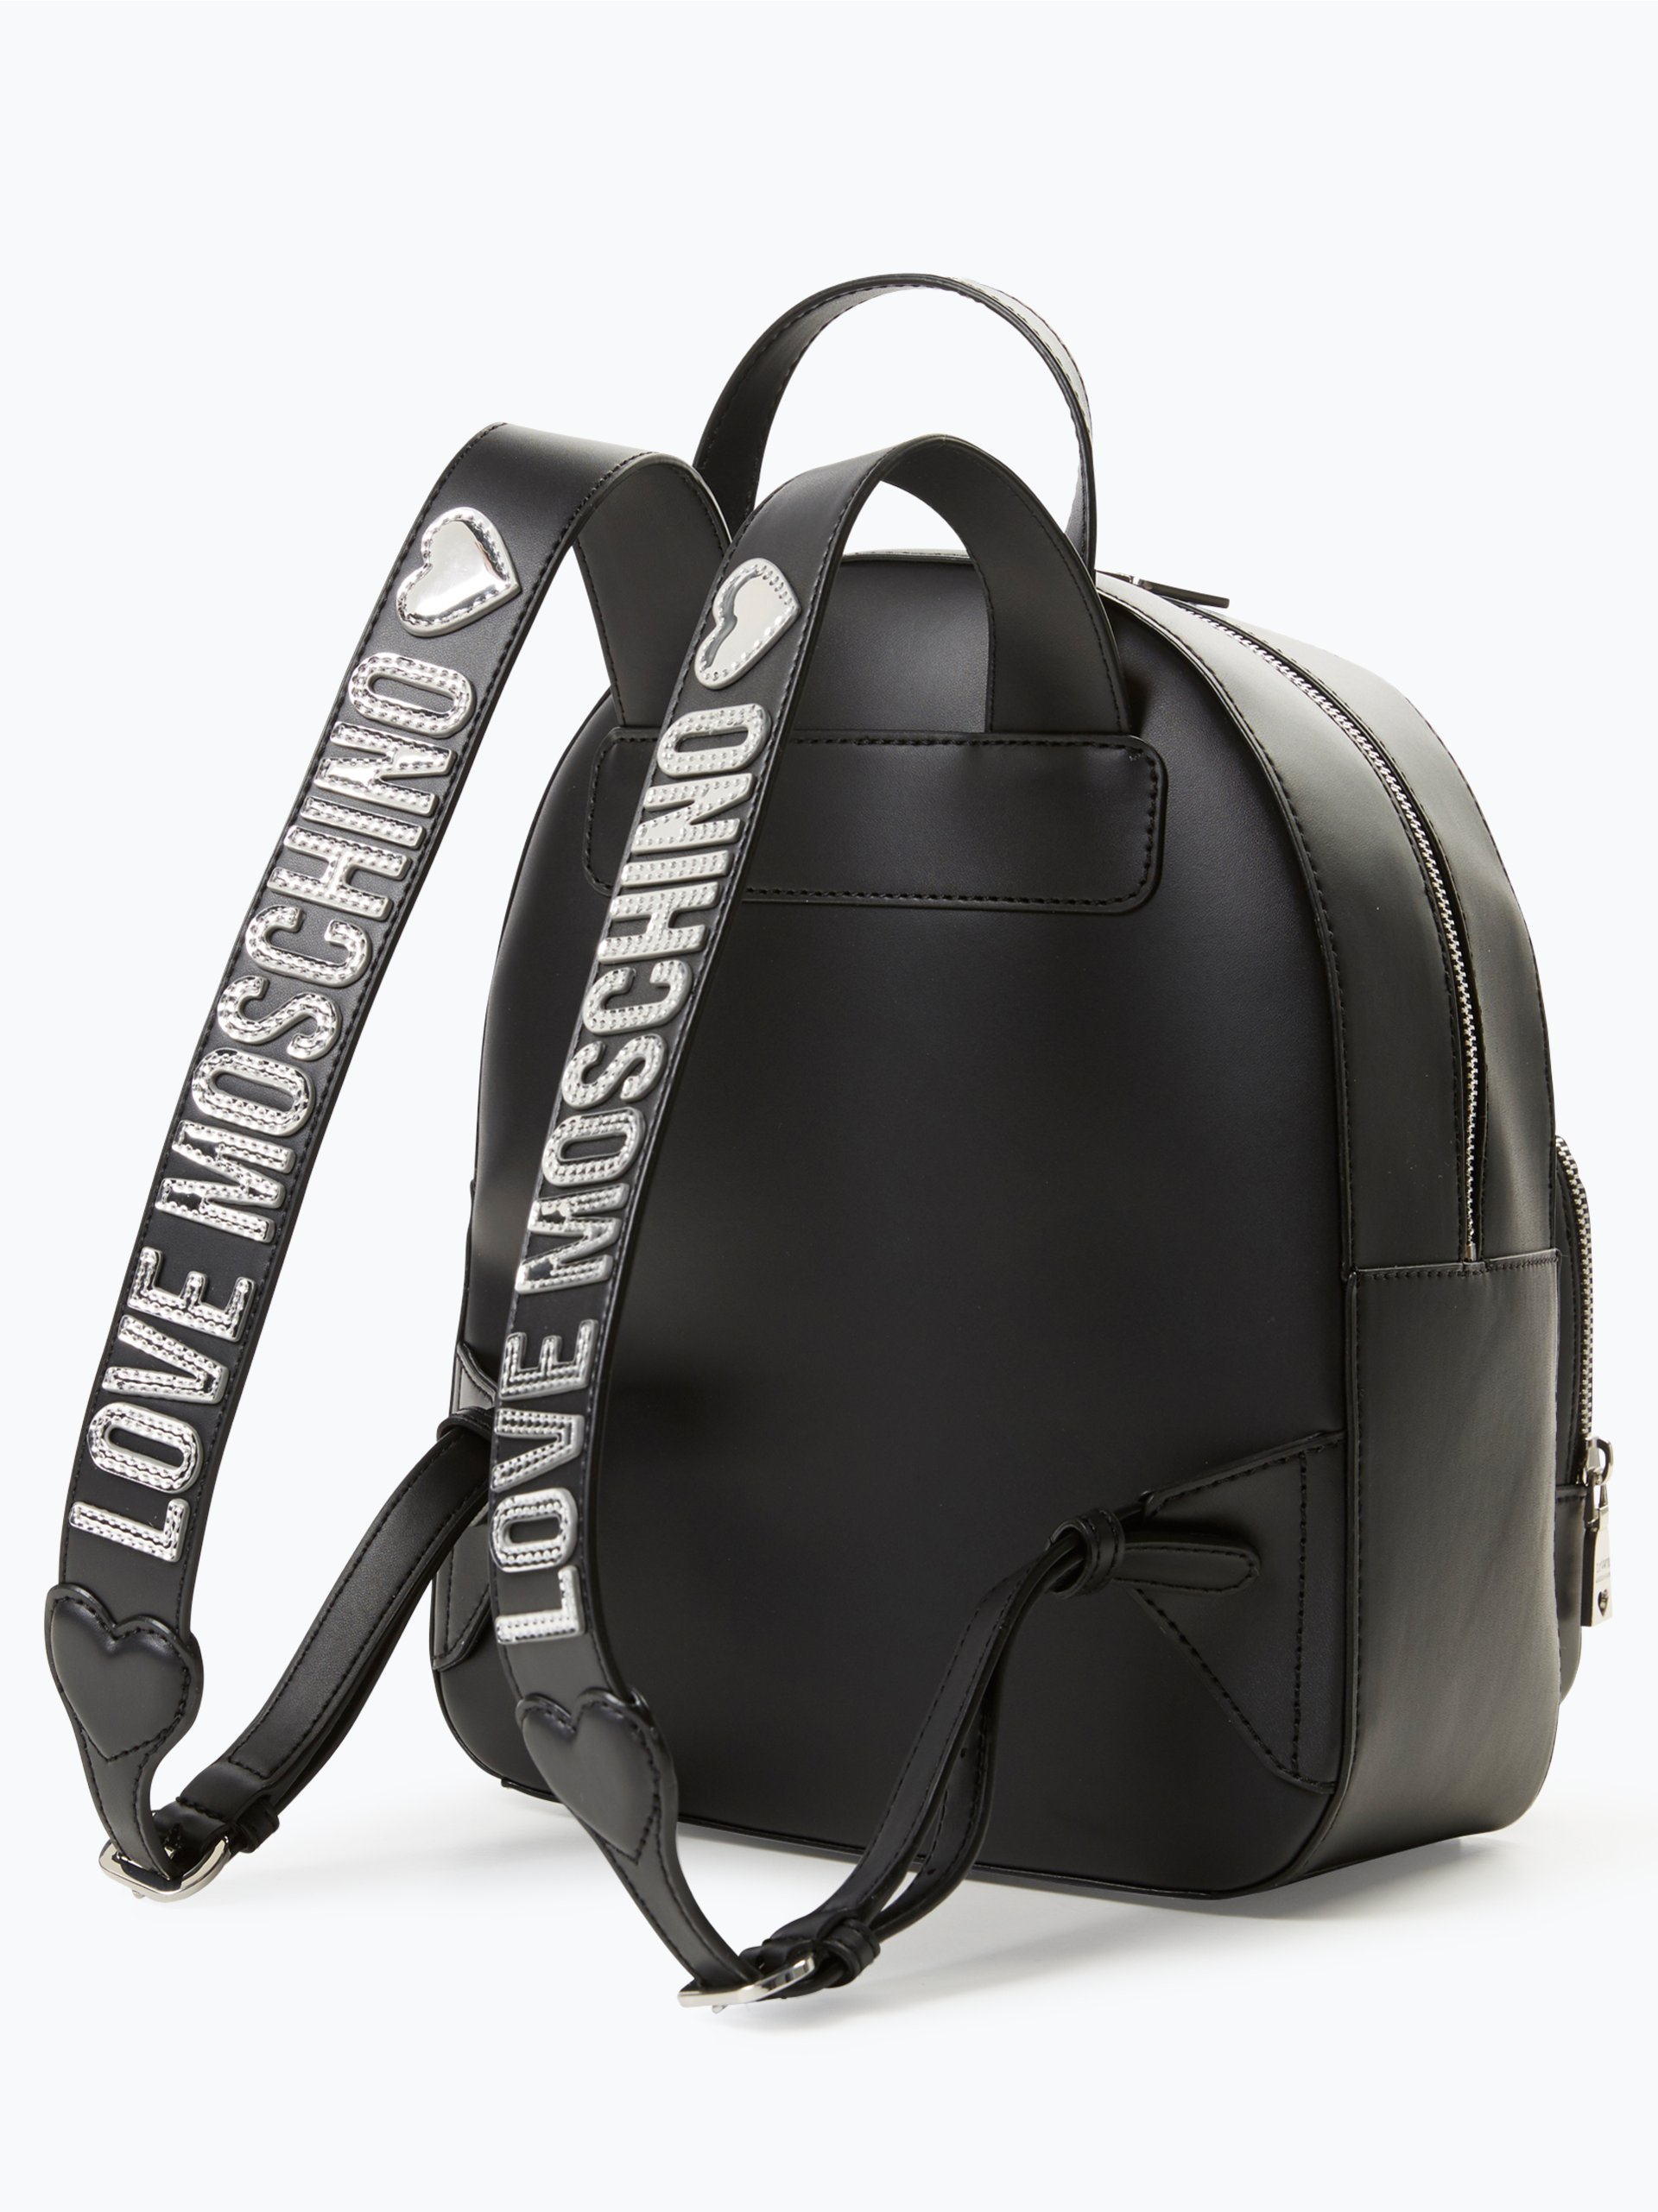 59231bb5a4816 Love Moschino Plecak damski z imitacji skóry kup online | VANGRAAF.COM